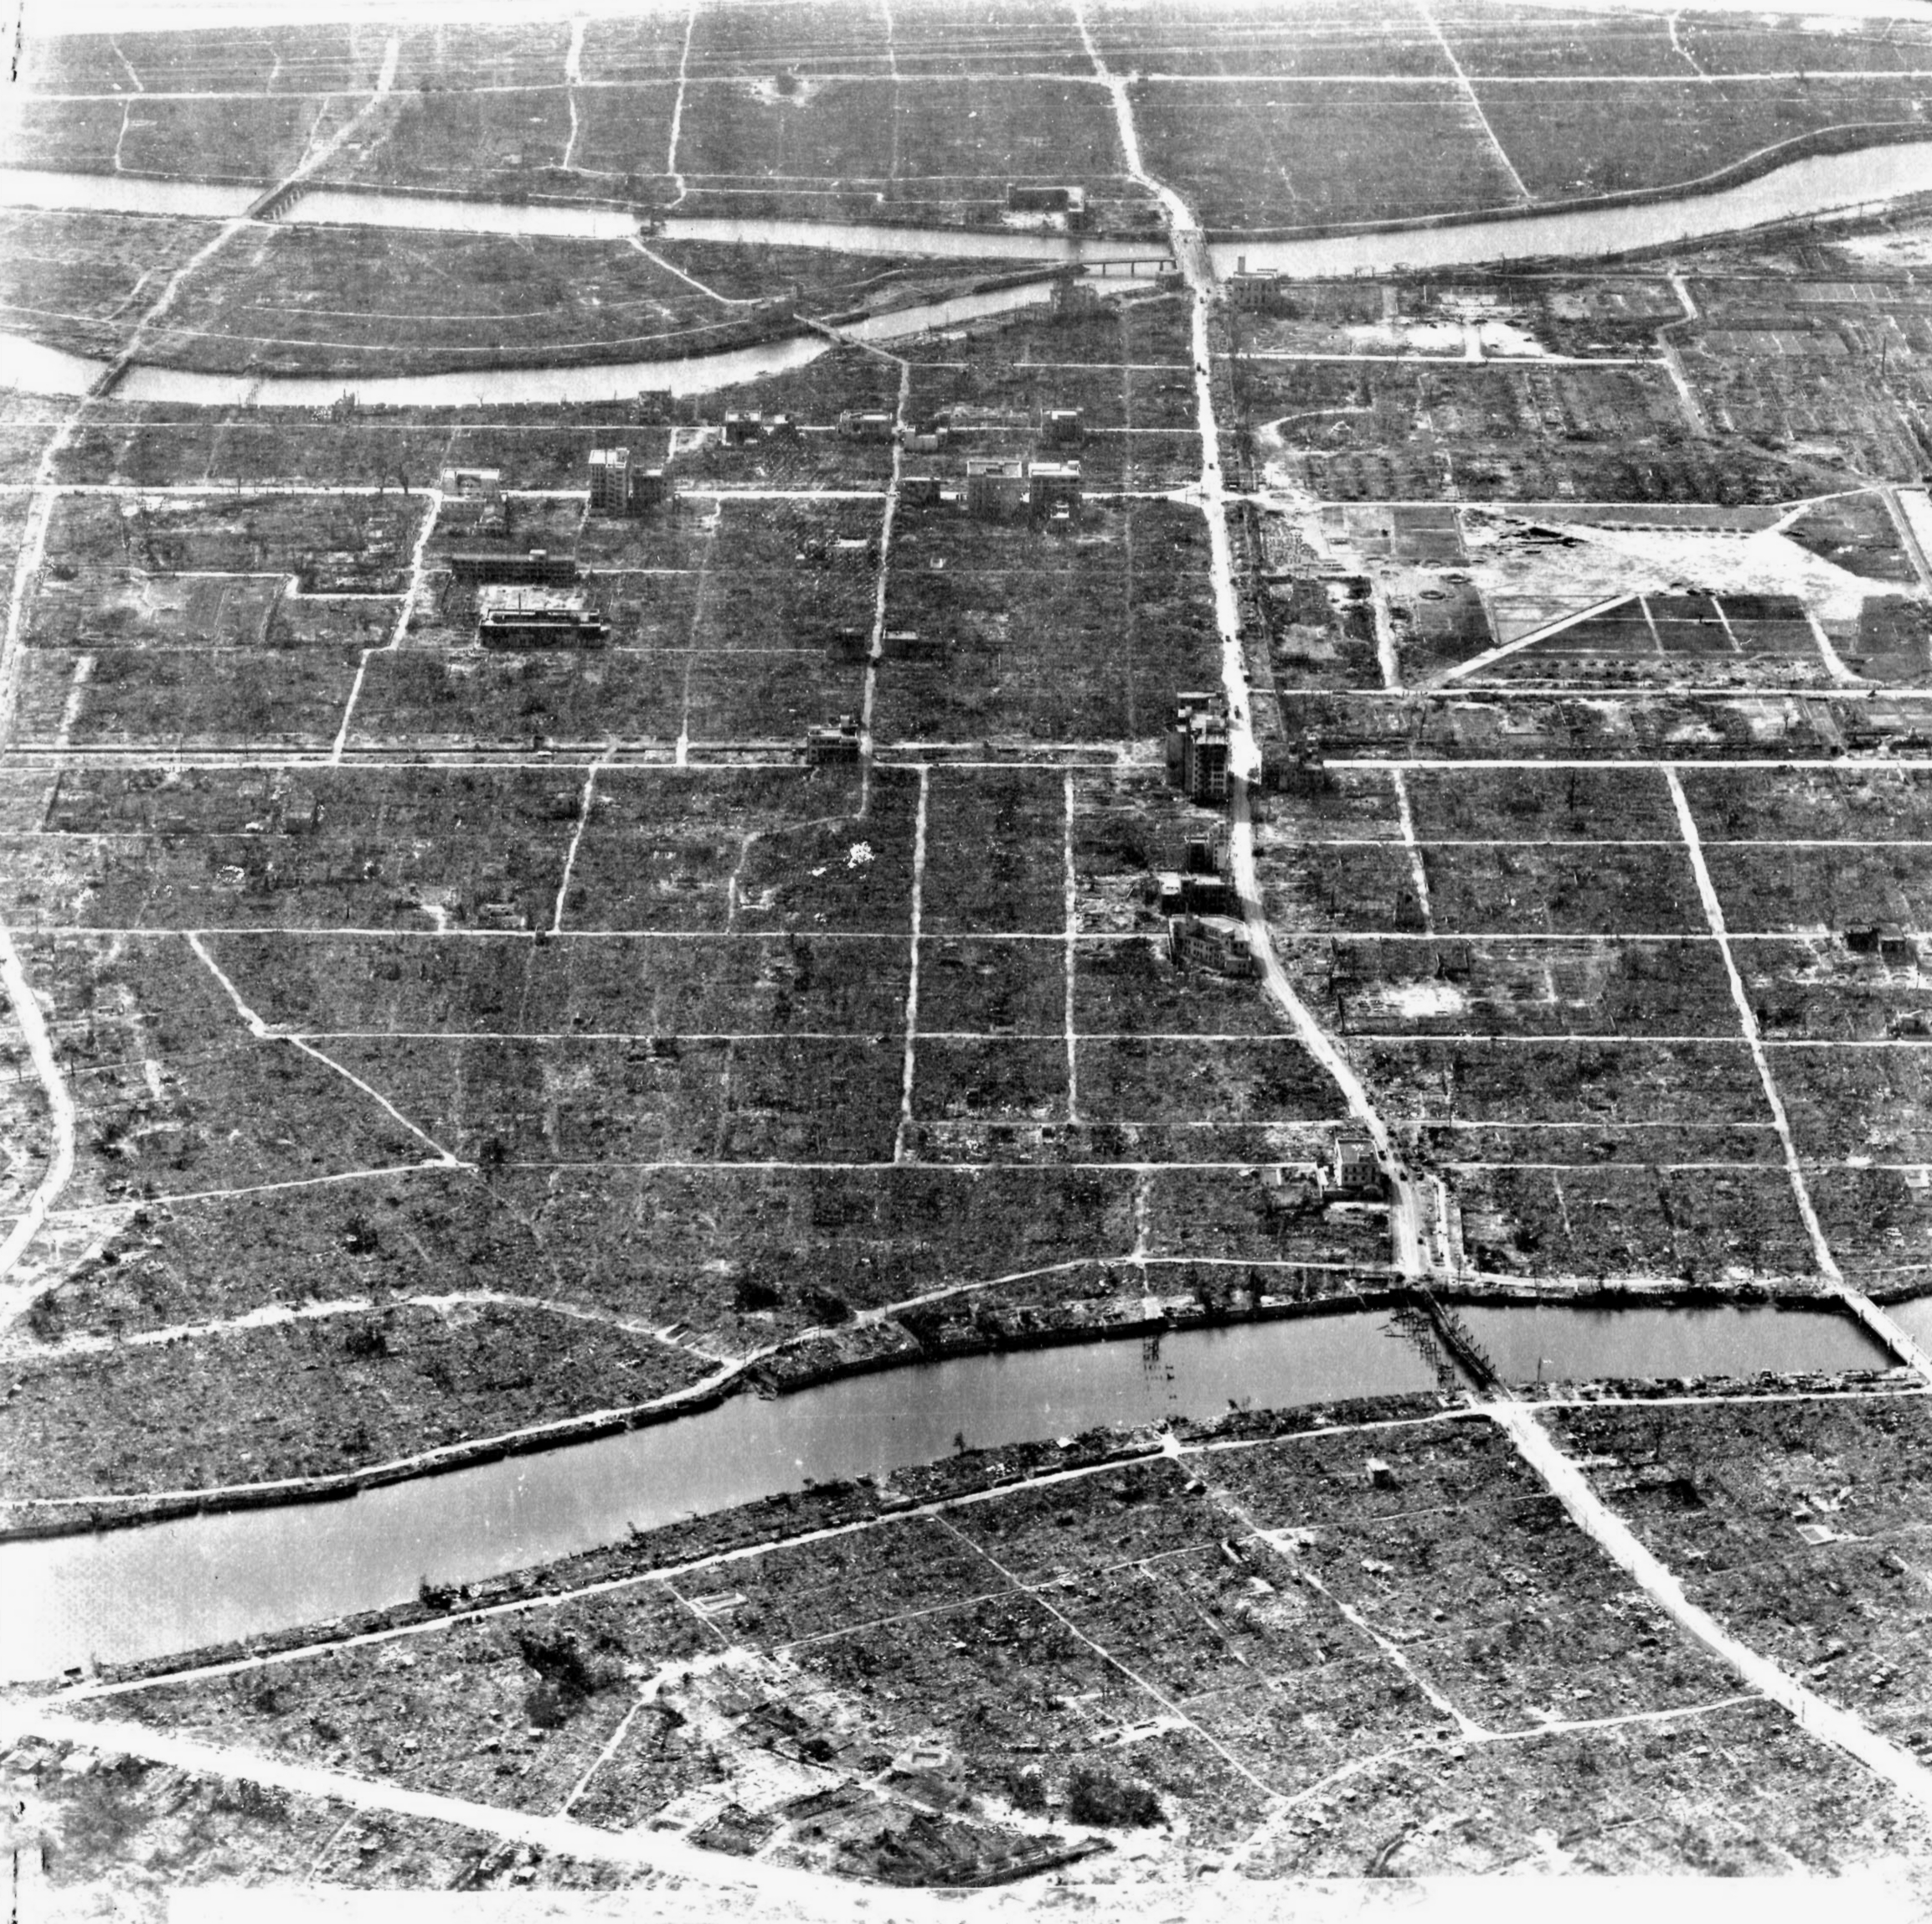 Why the atomic bombs of hiroshima